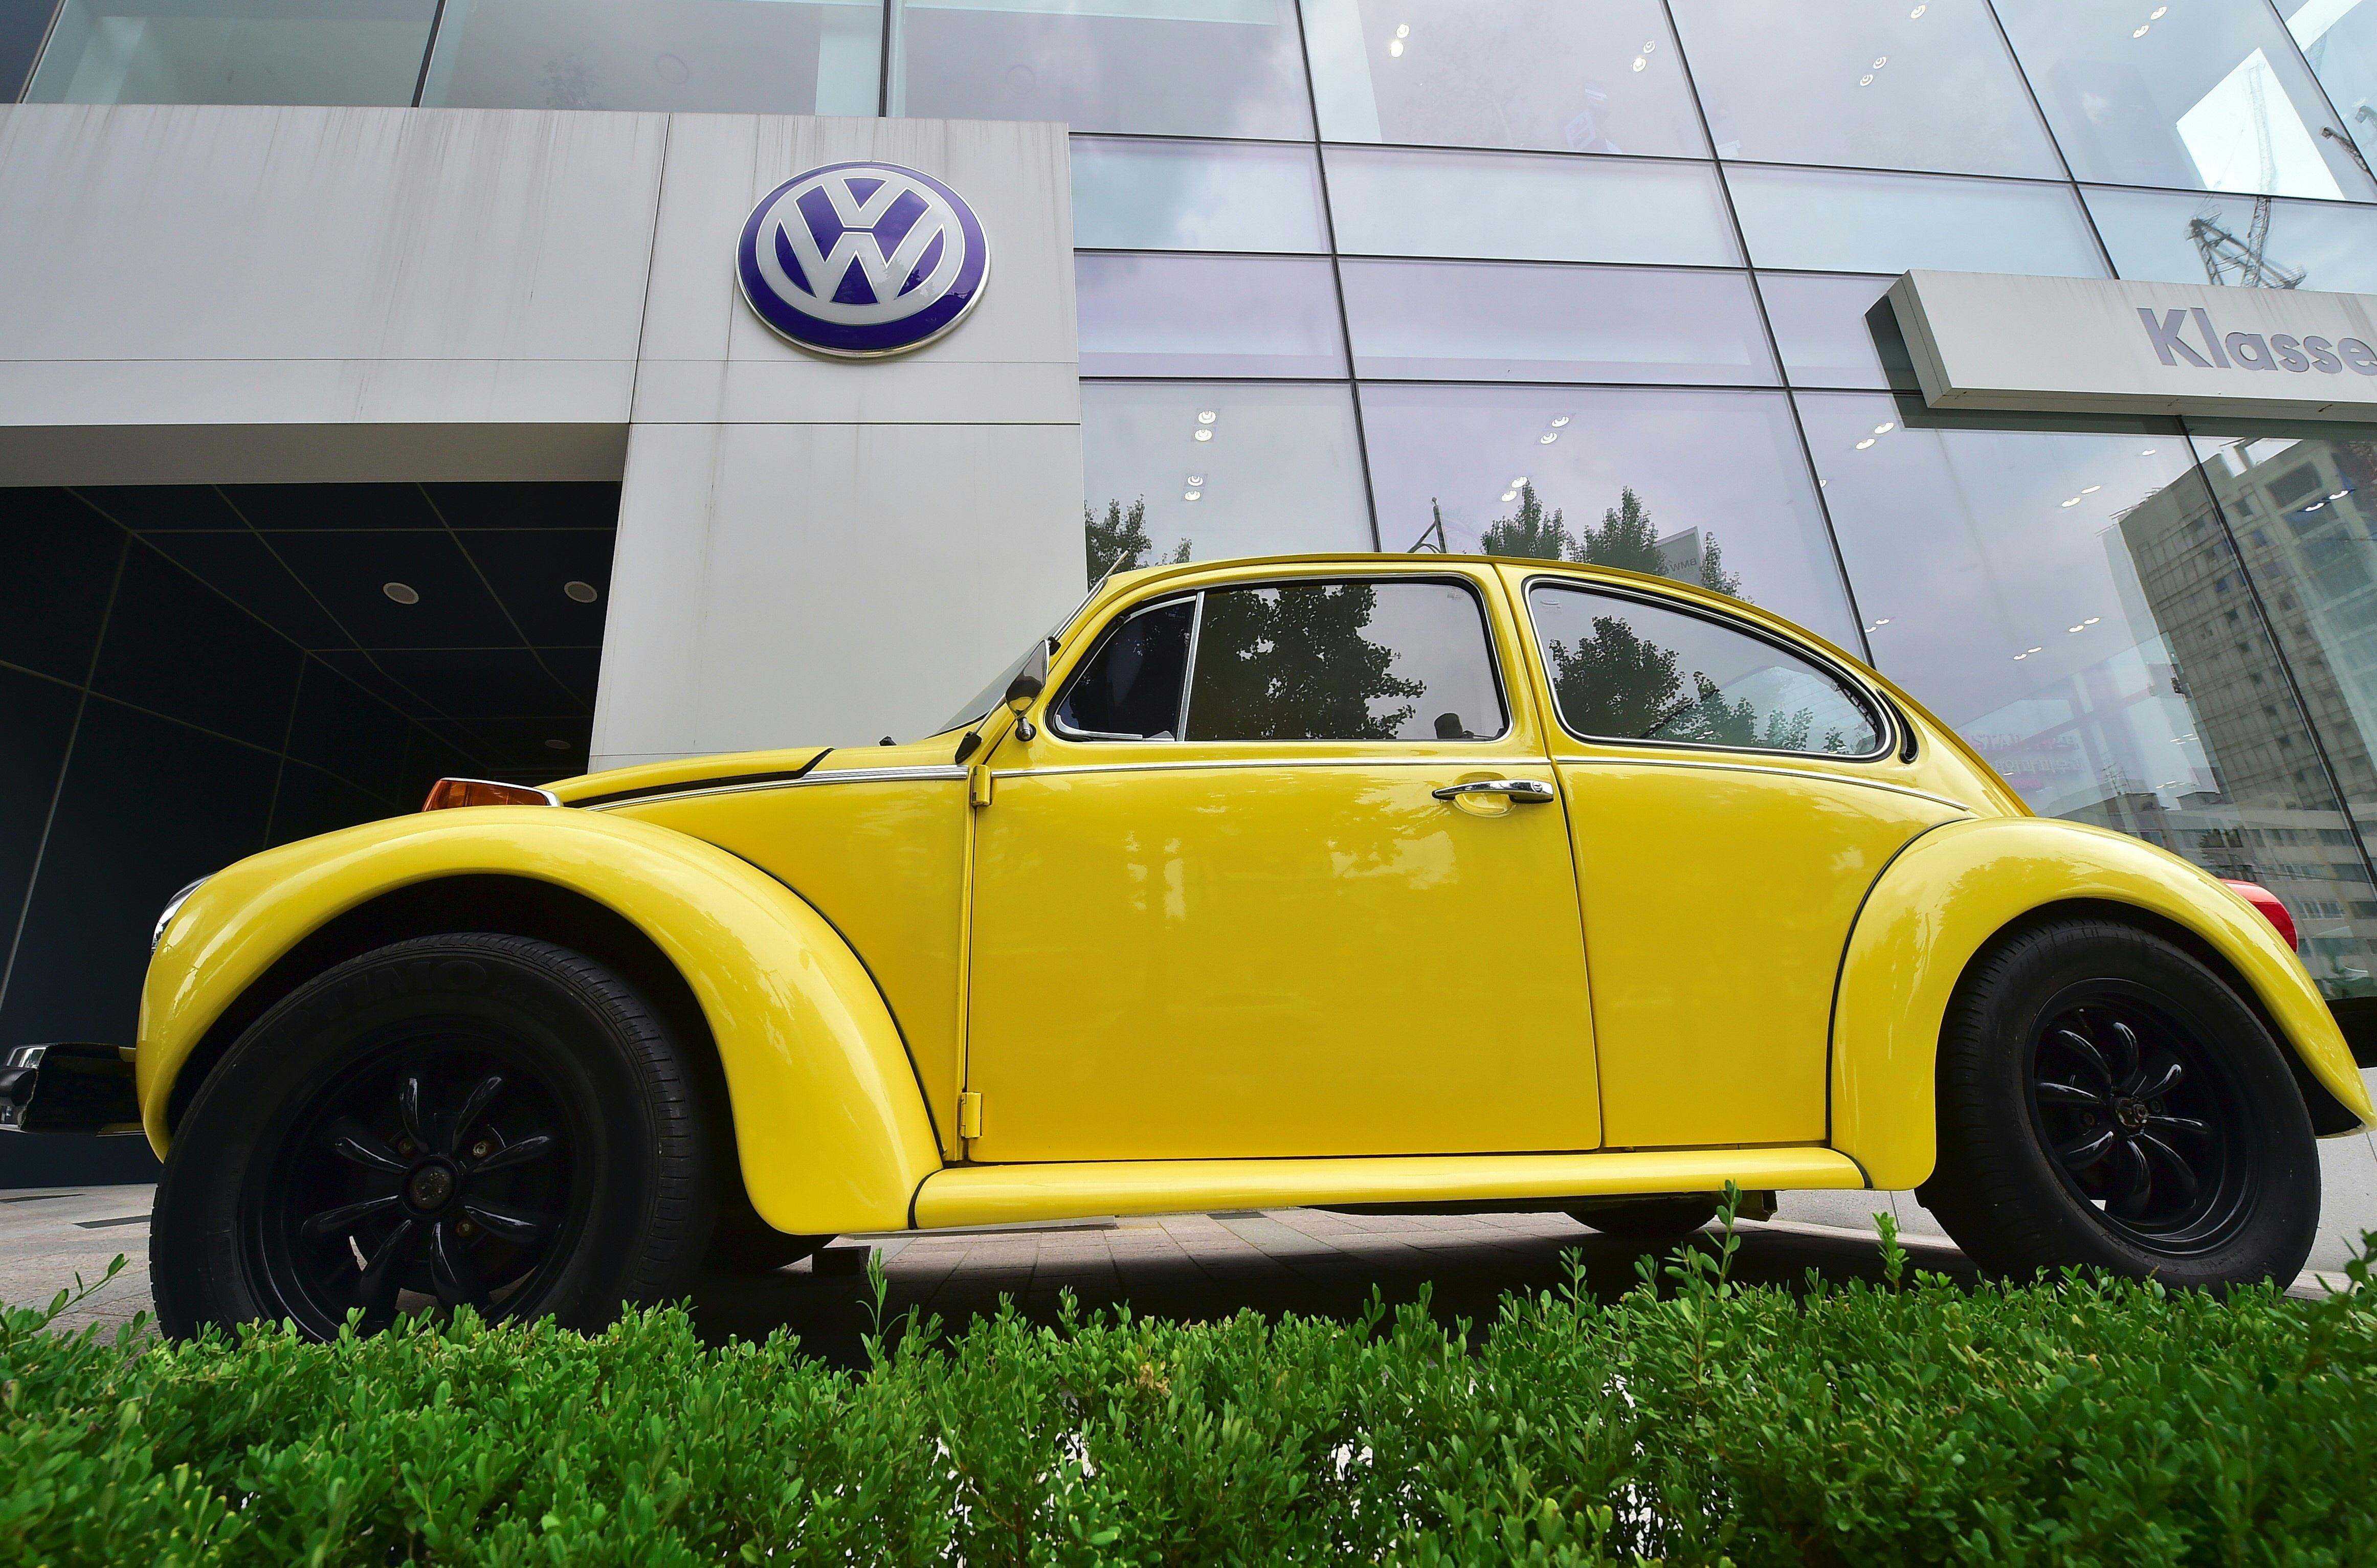 SKOREA-GERMANY-AUTOMOBILE-VOLKSWAGEN-FRAUD